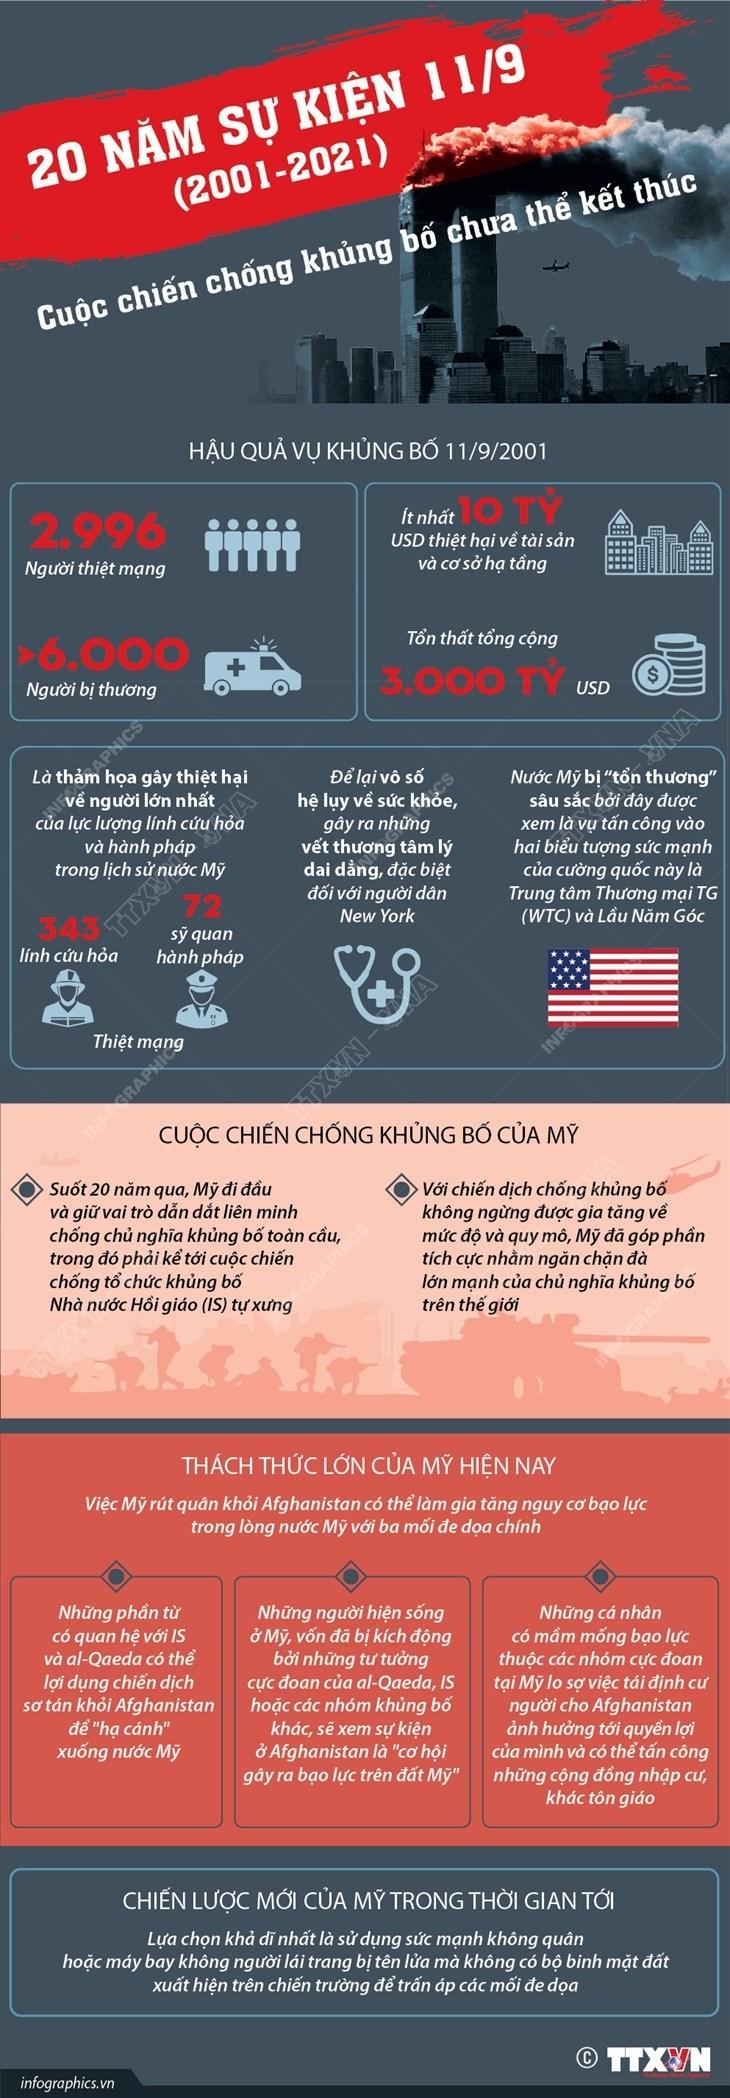 20 nam su kien 11/9: Cuoc chien chong khung bo chua the ket thuc hinh anh 1